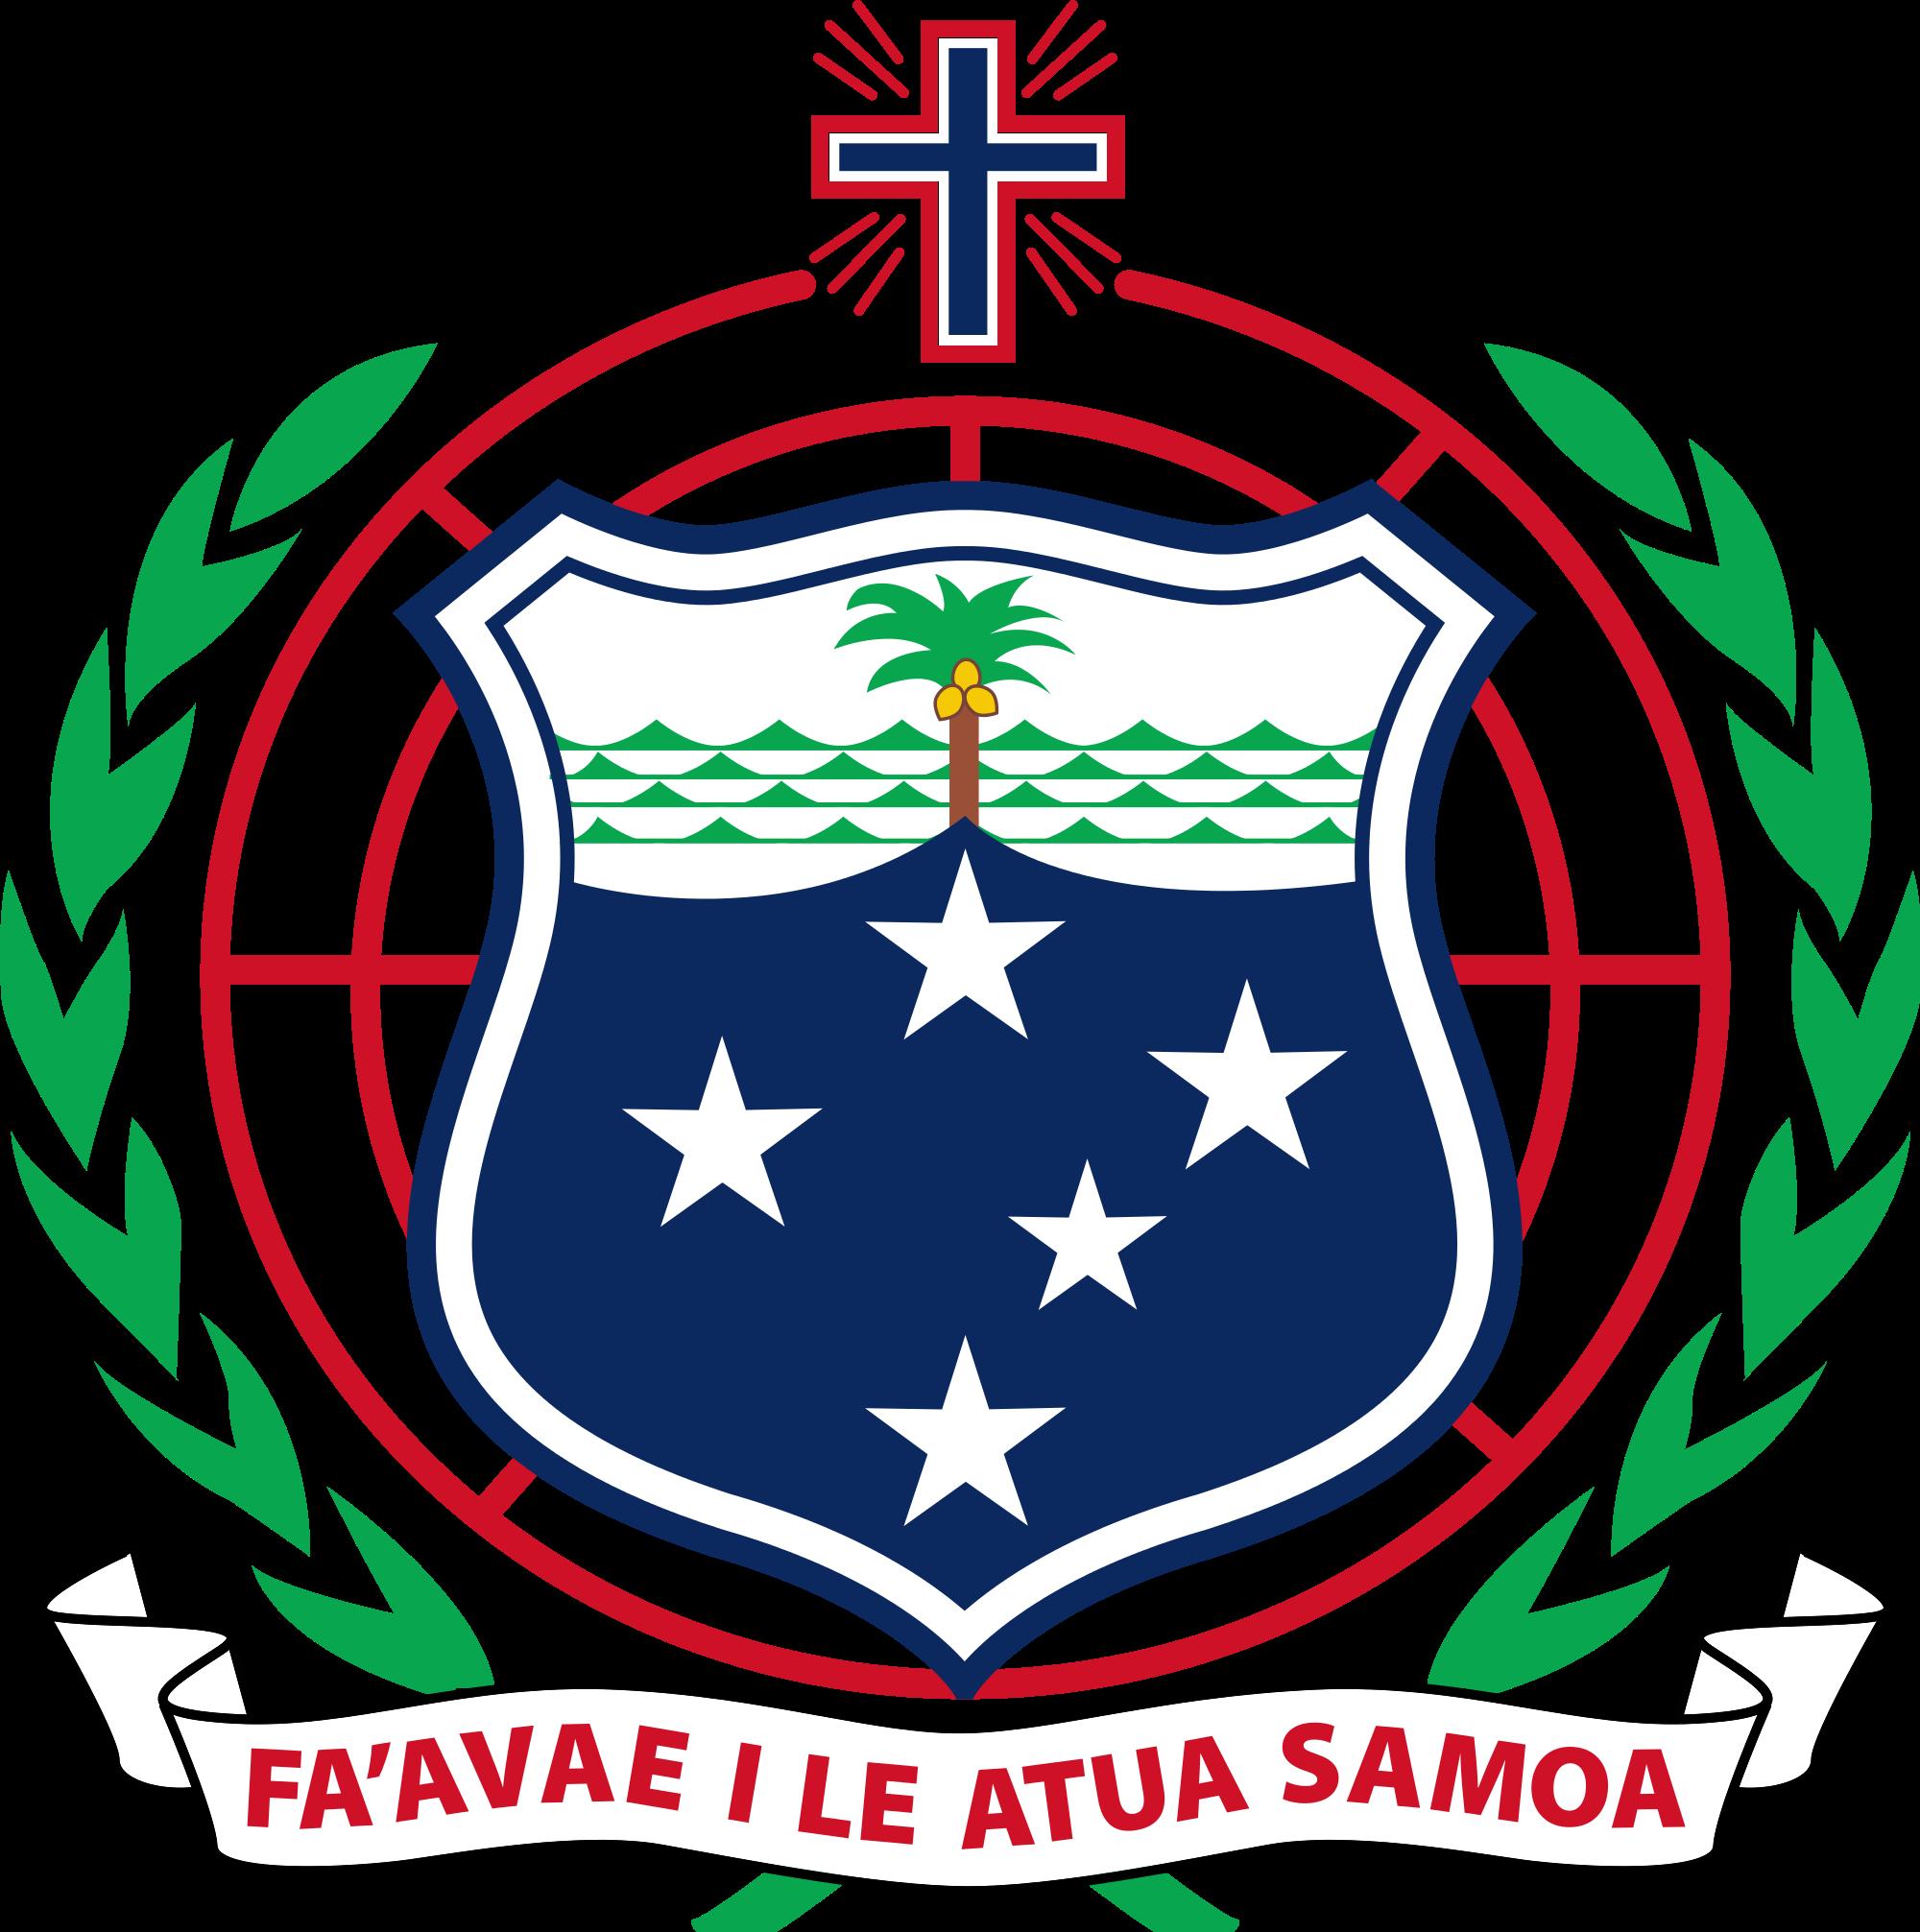 Wapen van Samoa